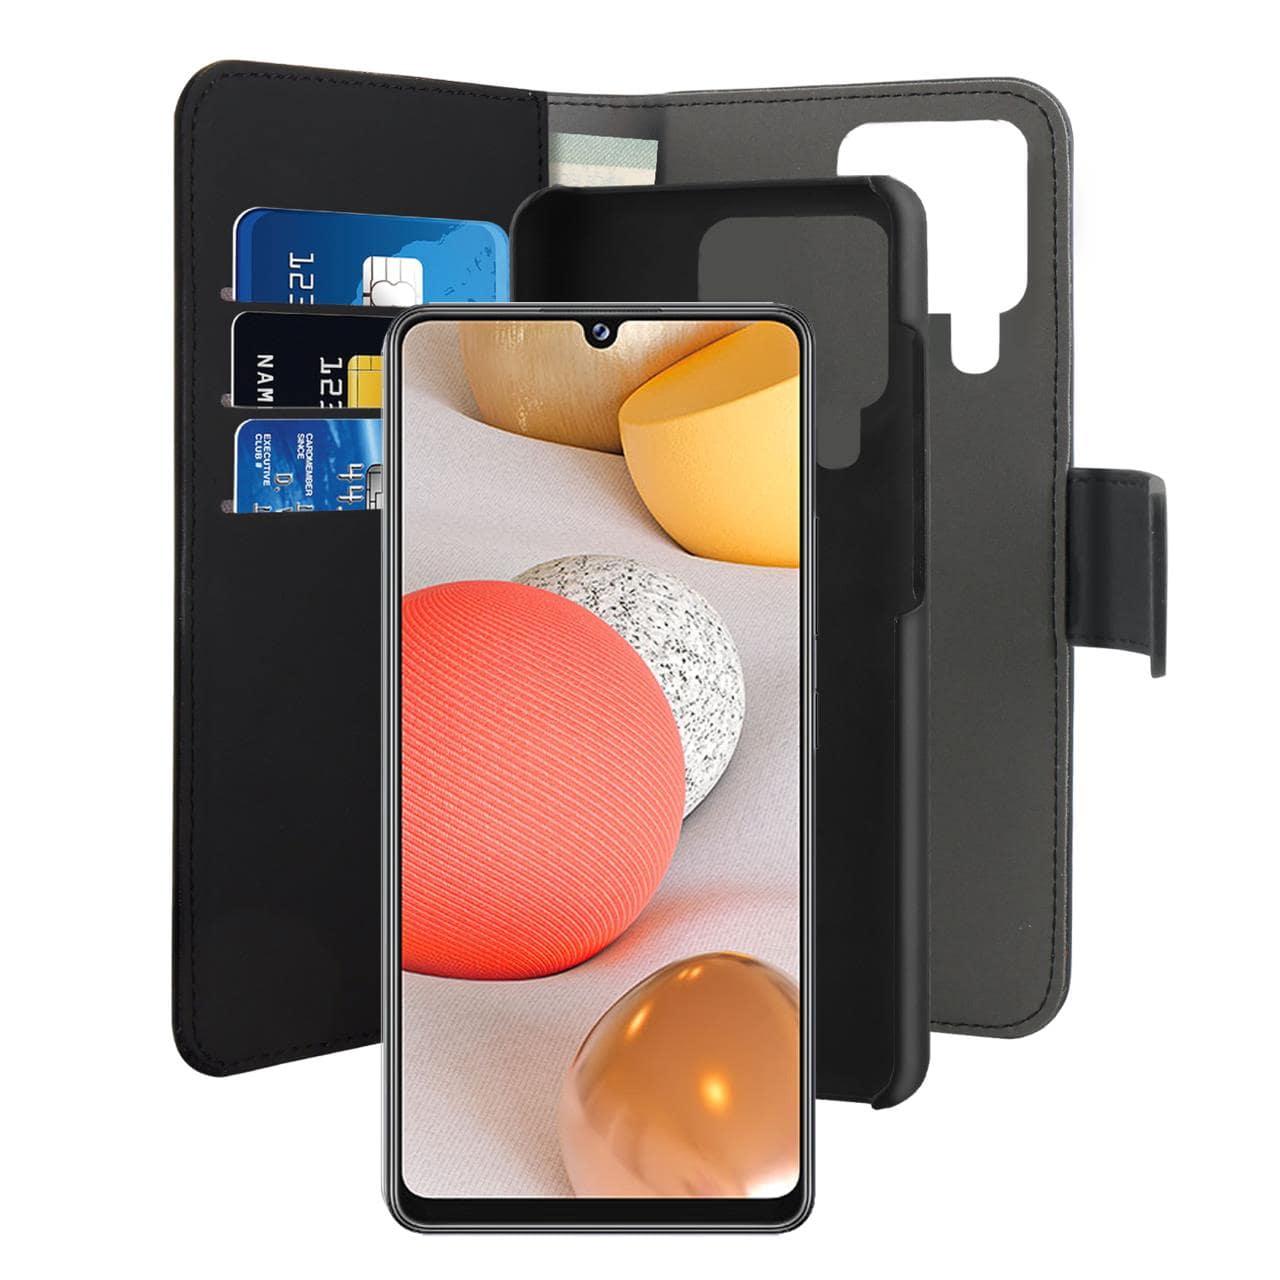 puro-custodia-wallet-detachable-samsung-galaxy-a42-5g_01-min